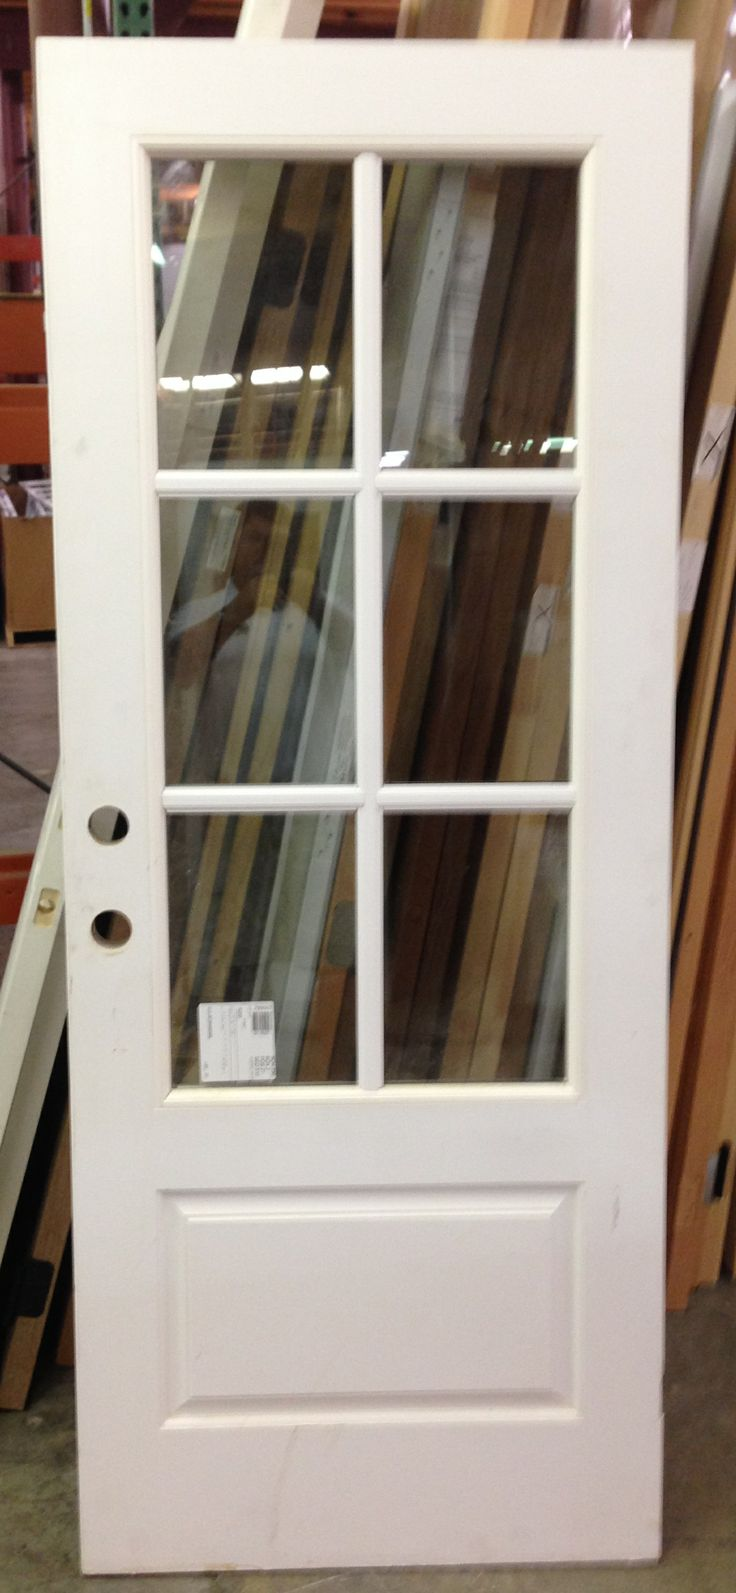 34 lite 6 lite 1 14 SDL bar fiberglass EXTERIOR FRONT DOOR wwwwindsonglifecom  Doors